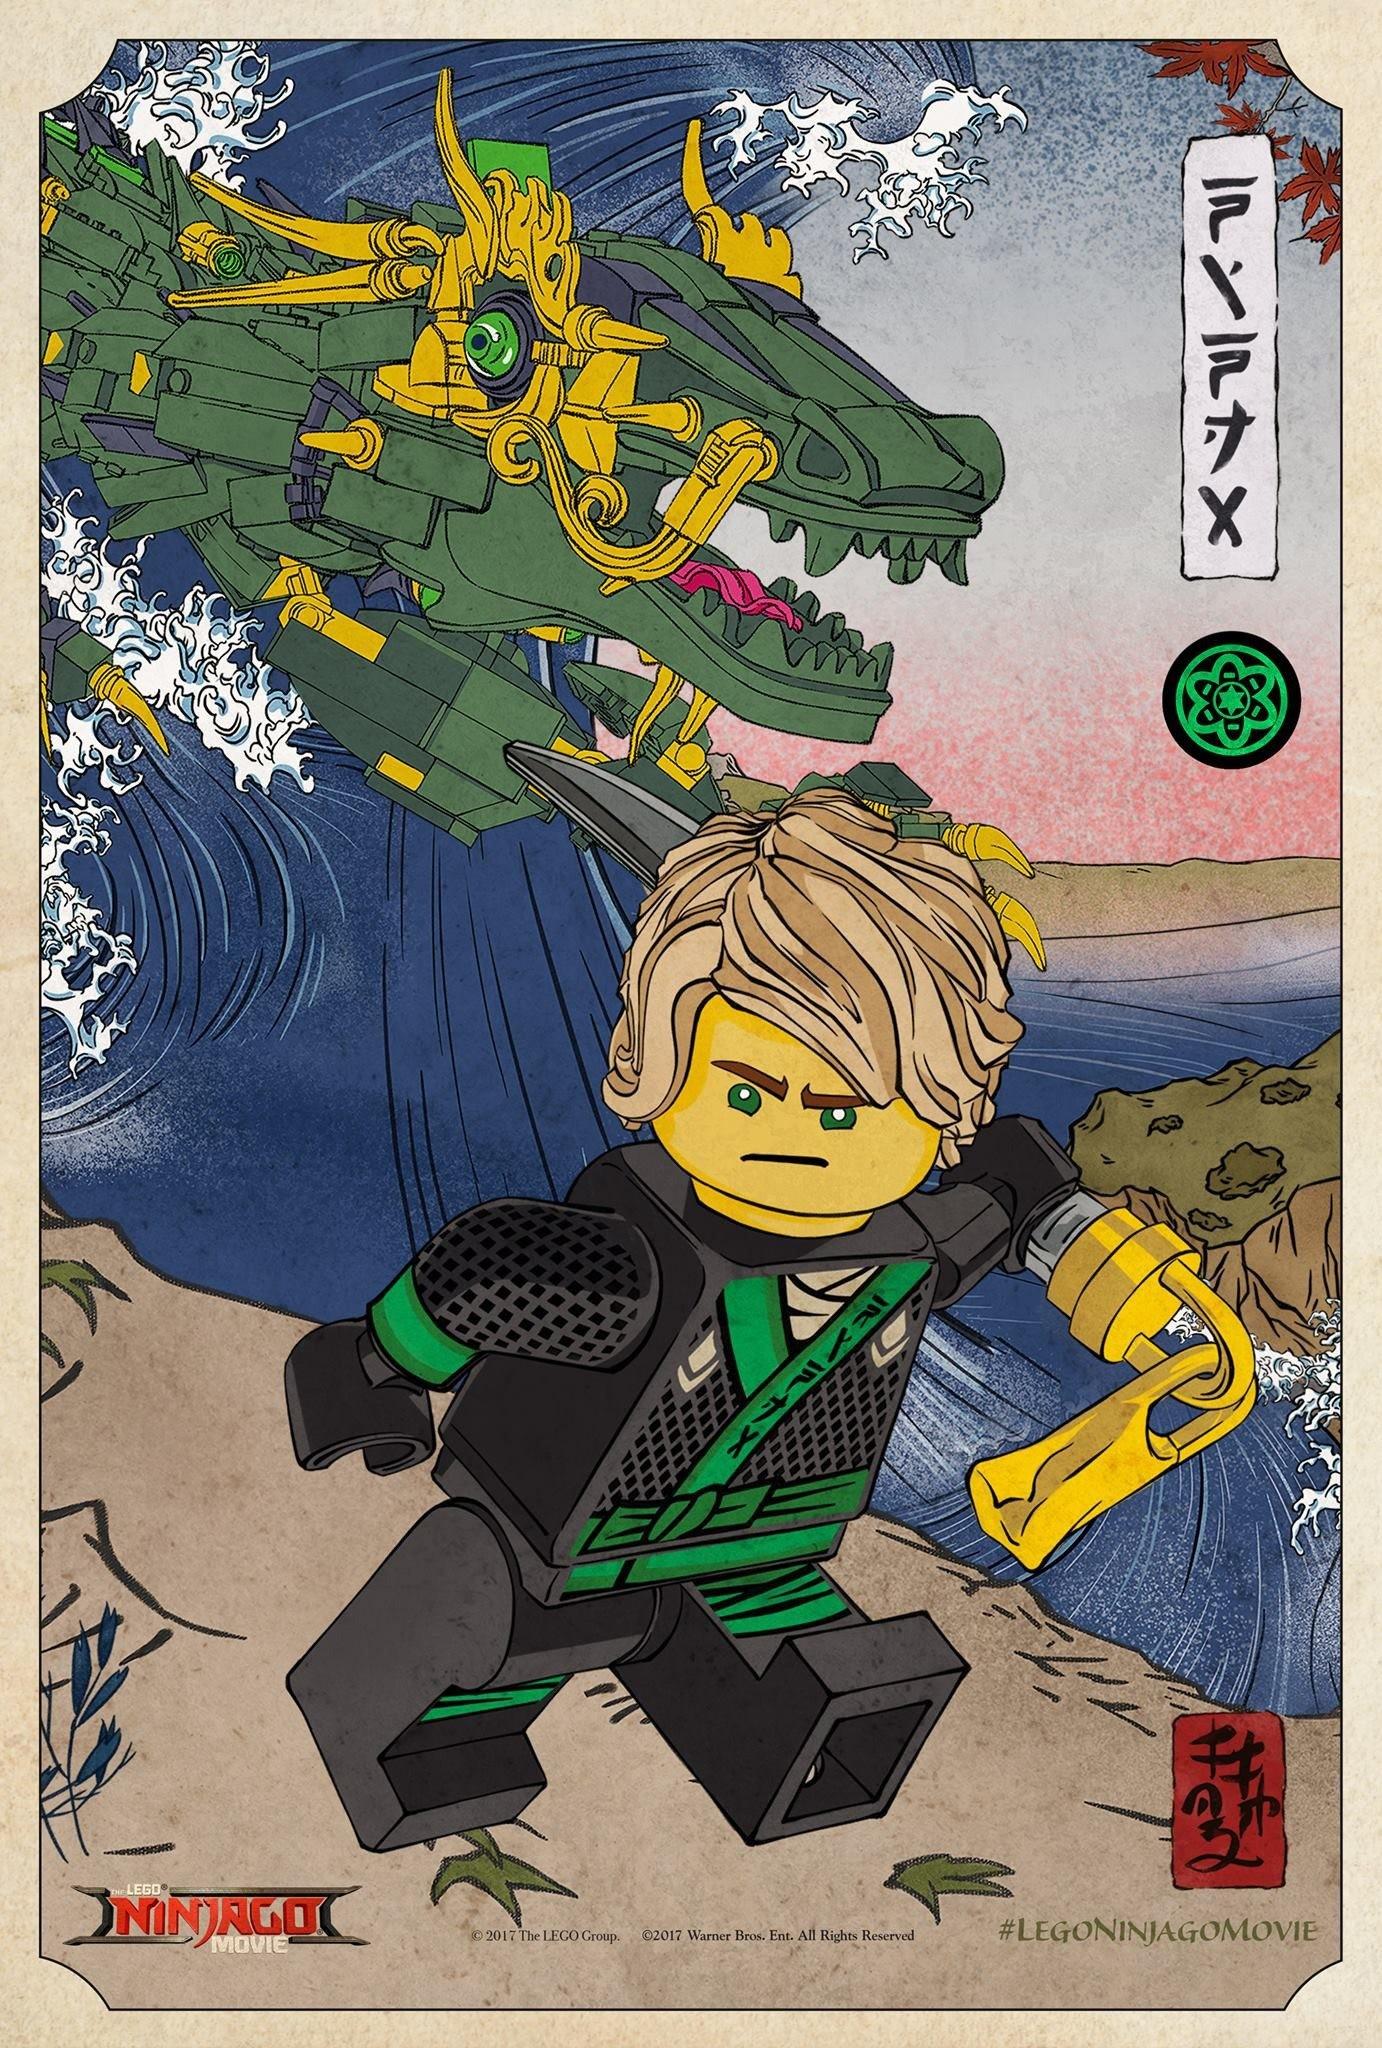 Ninjago HD Wallpaper 71 Images